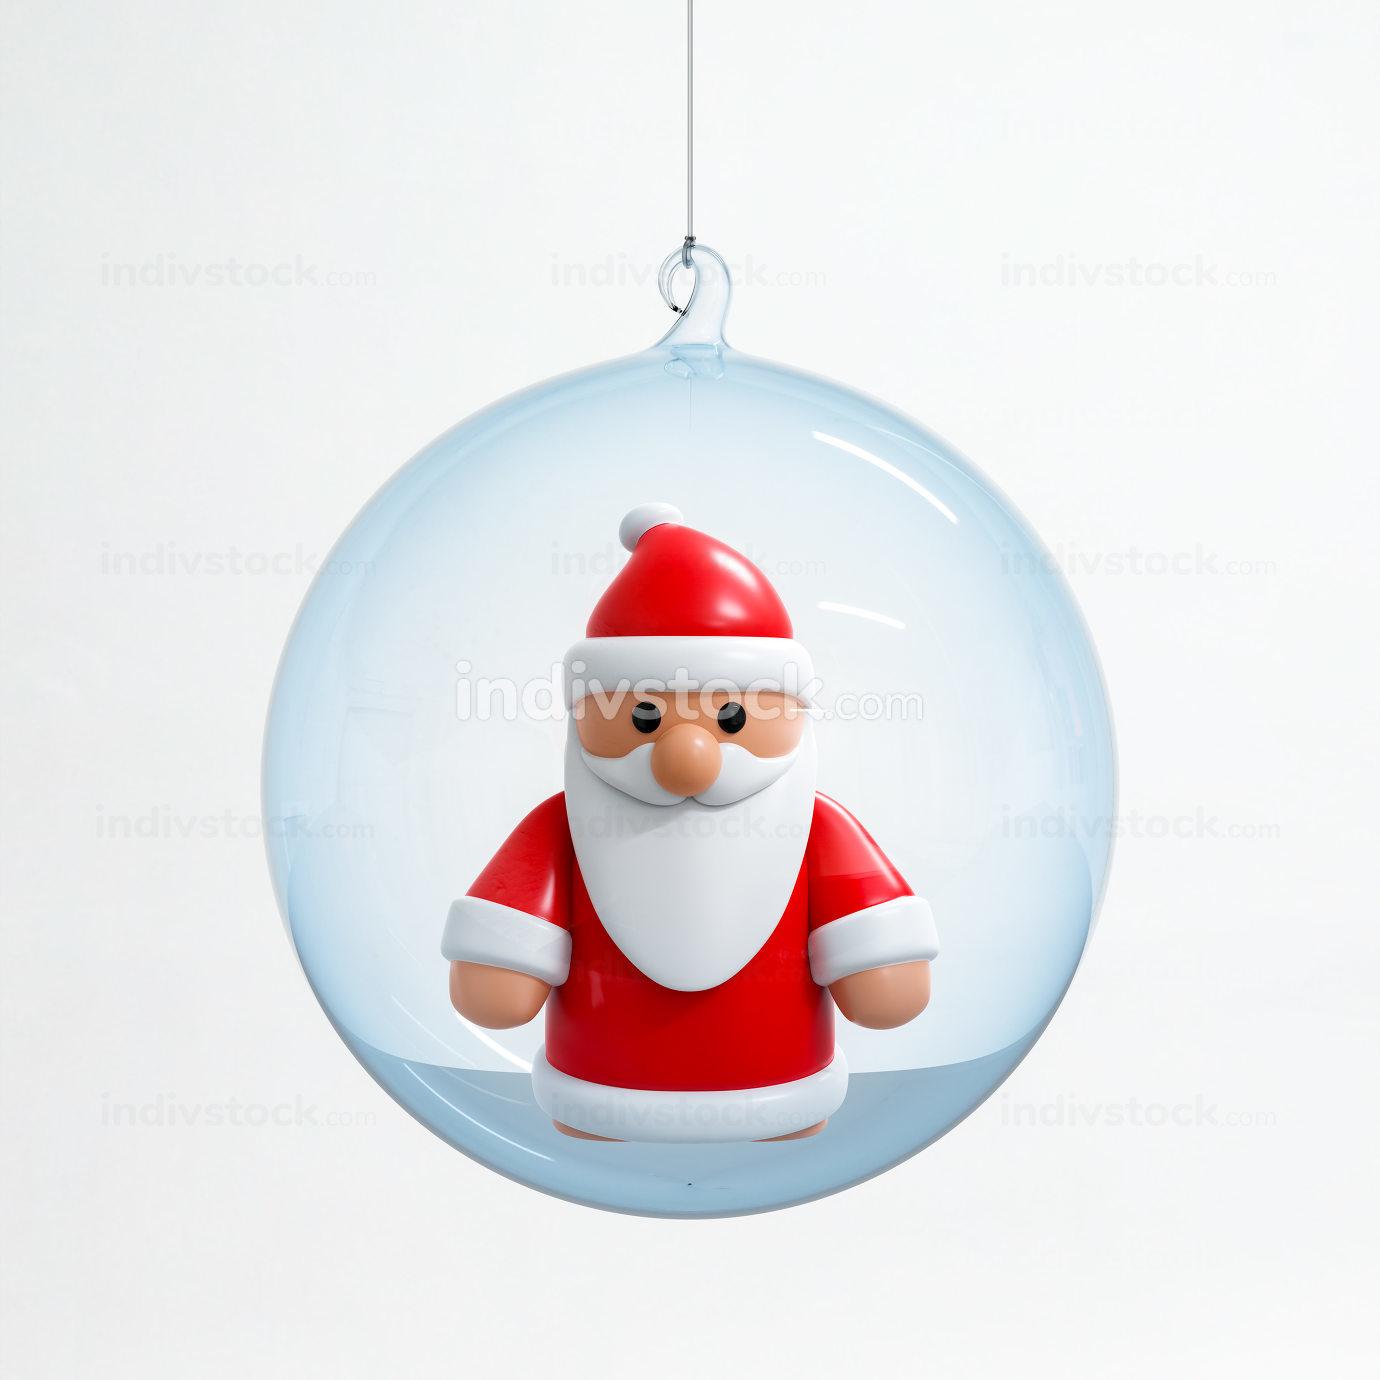 Santa Claus inside a Christmas ball, 3D illustration